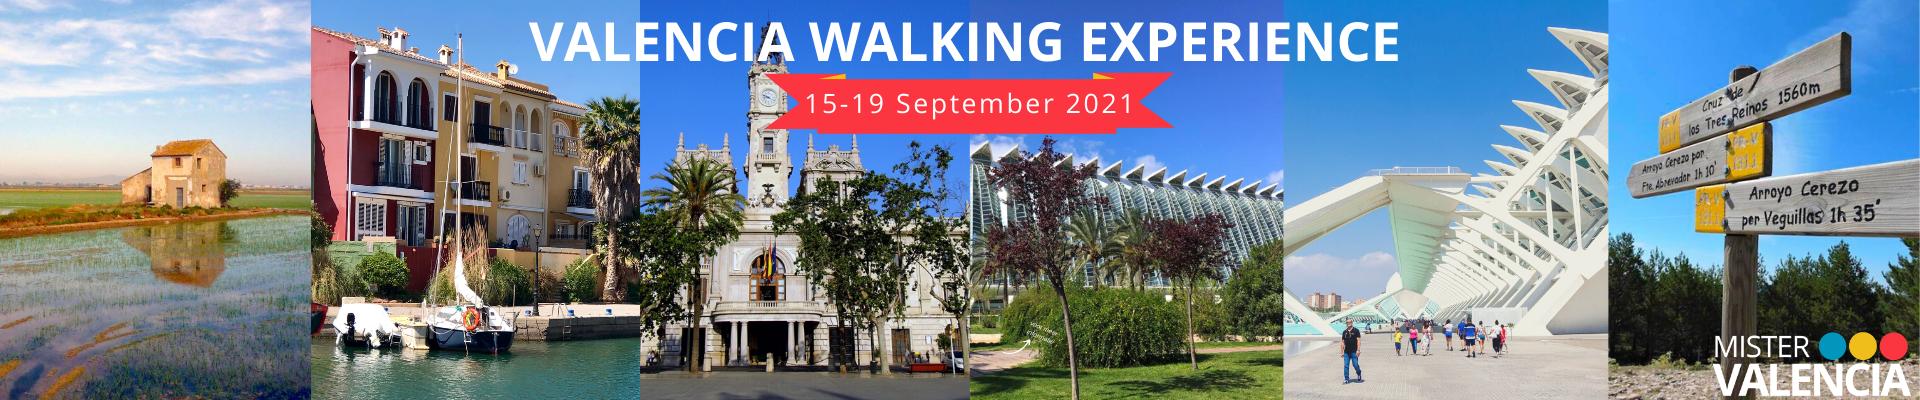 Valencia Walking Experience Sept 2021 (English)